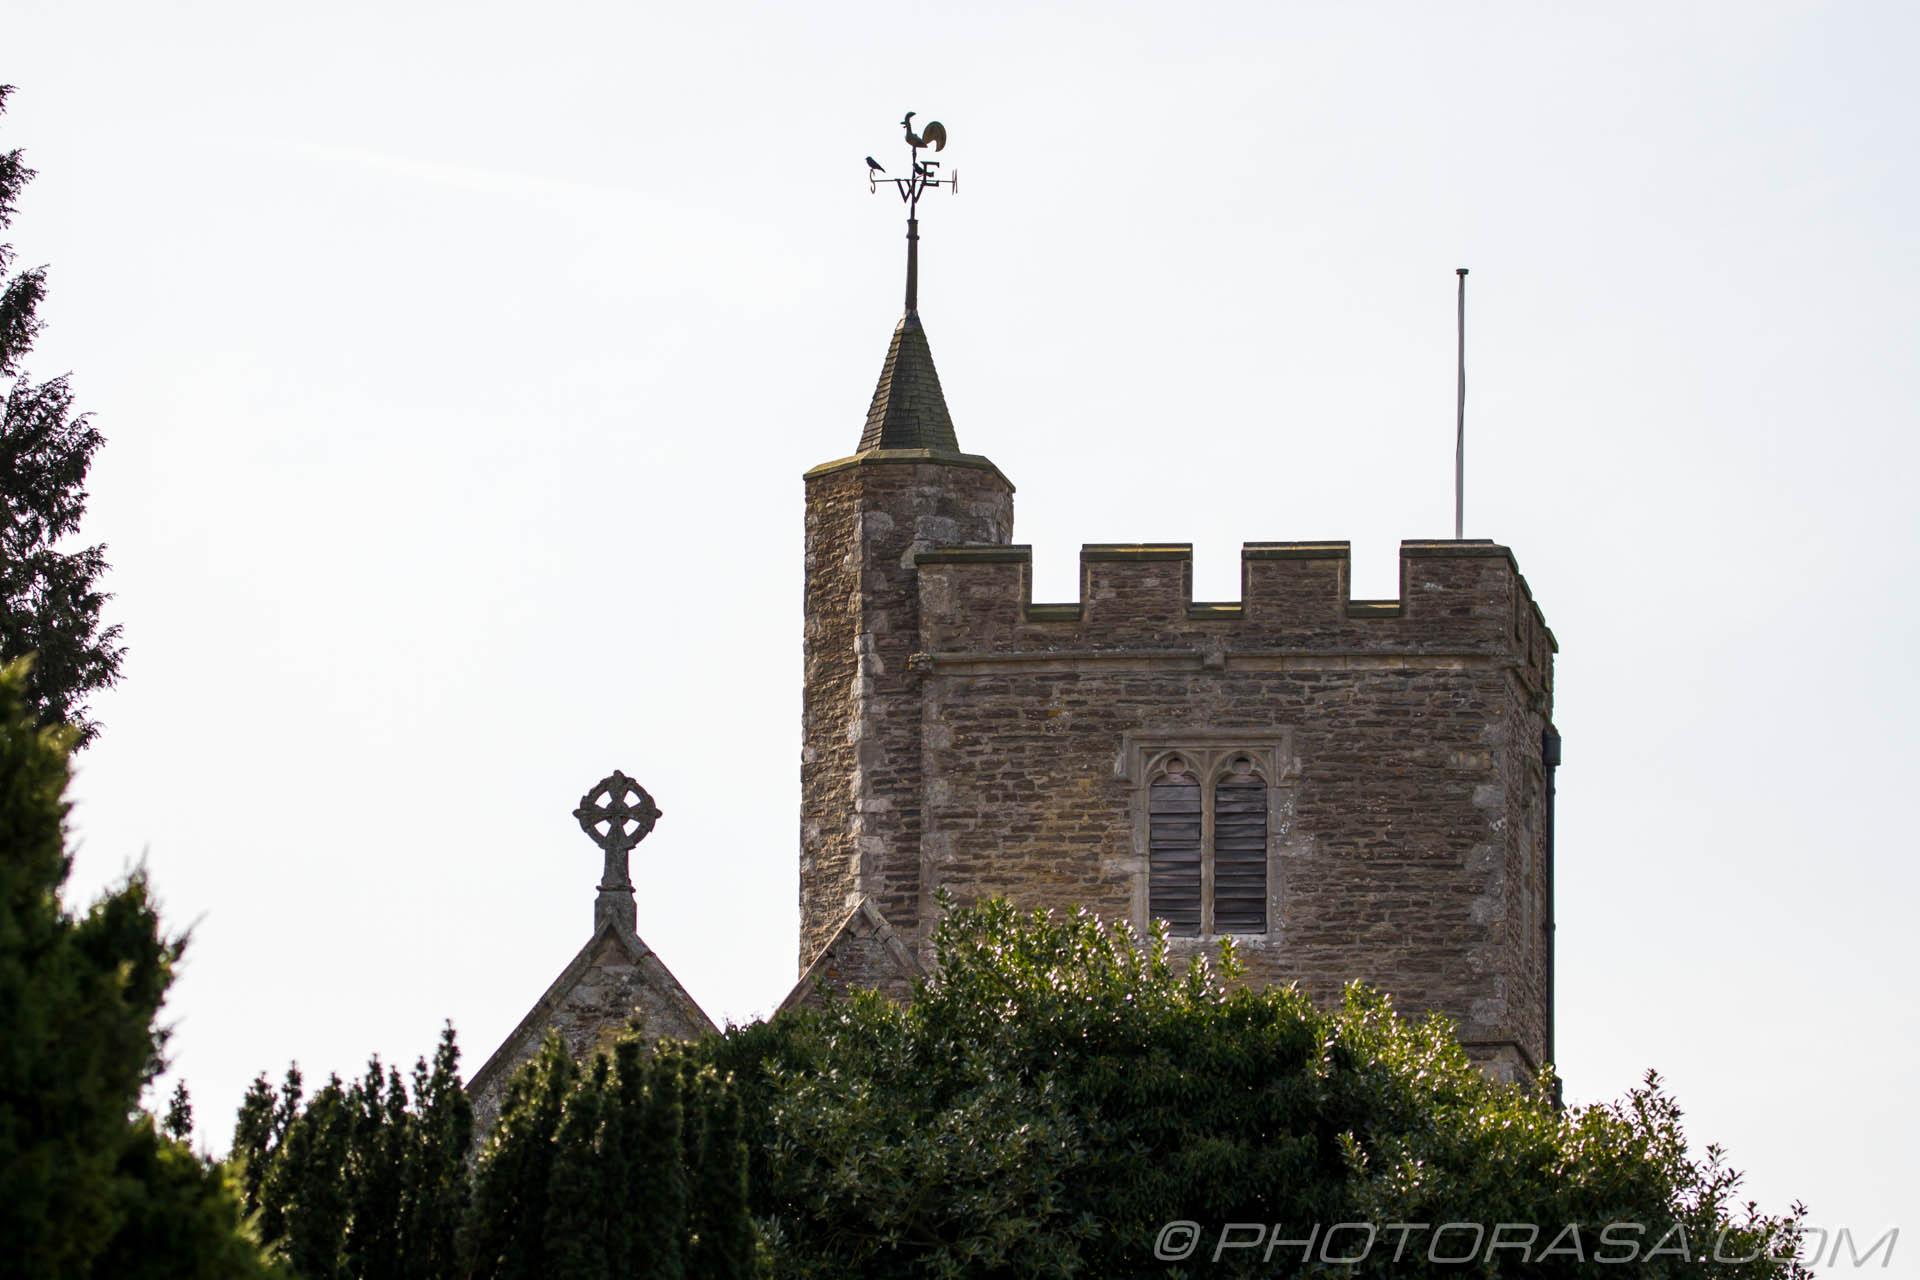 https://photorasa.com/saints-church-staplehurst-kent/church-tower/